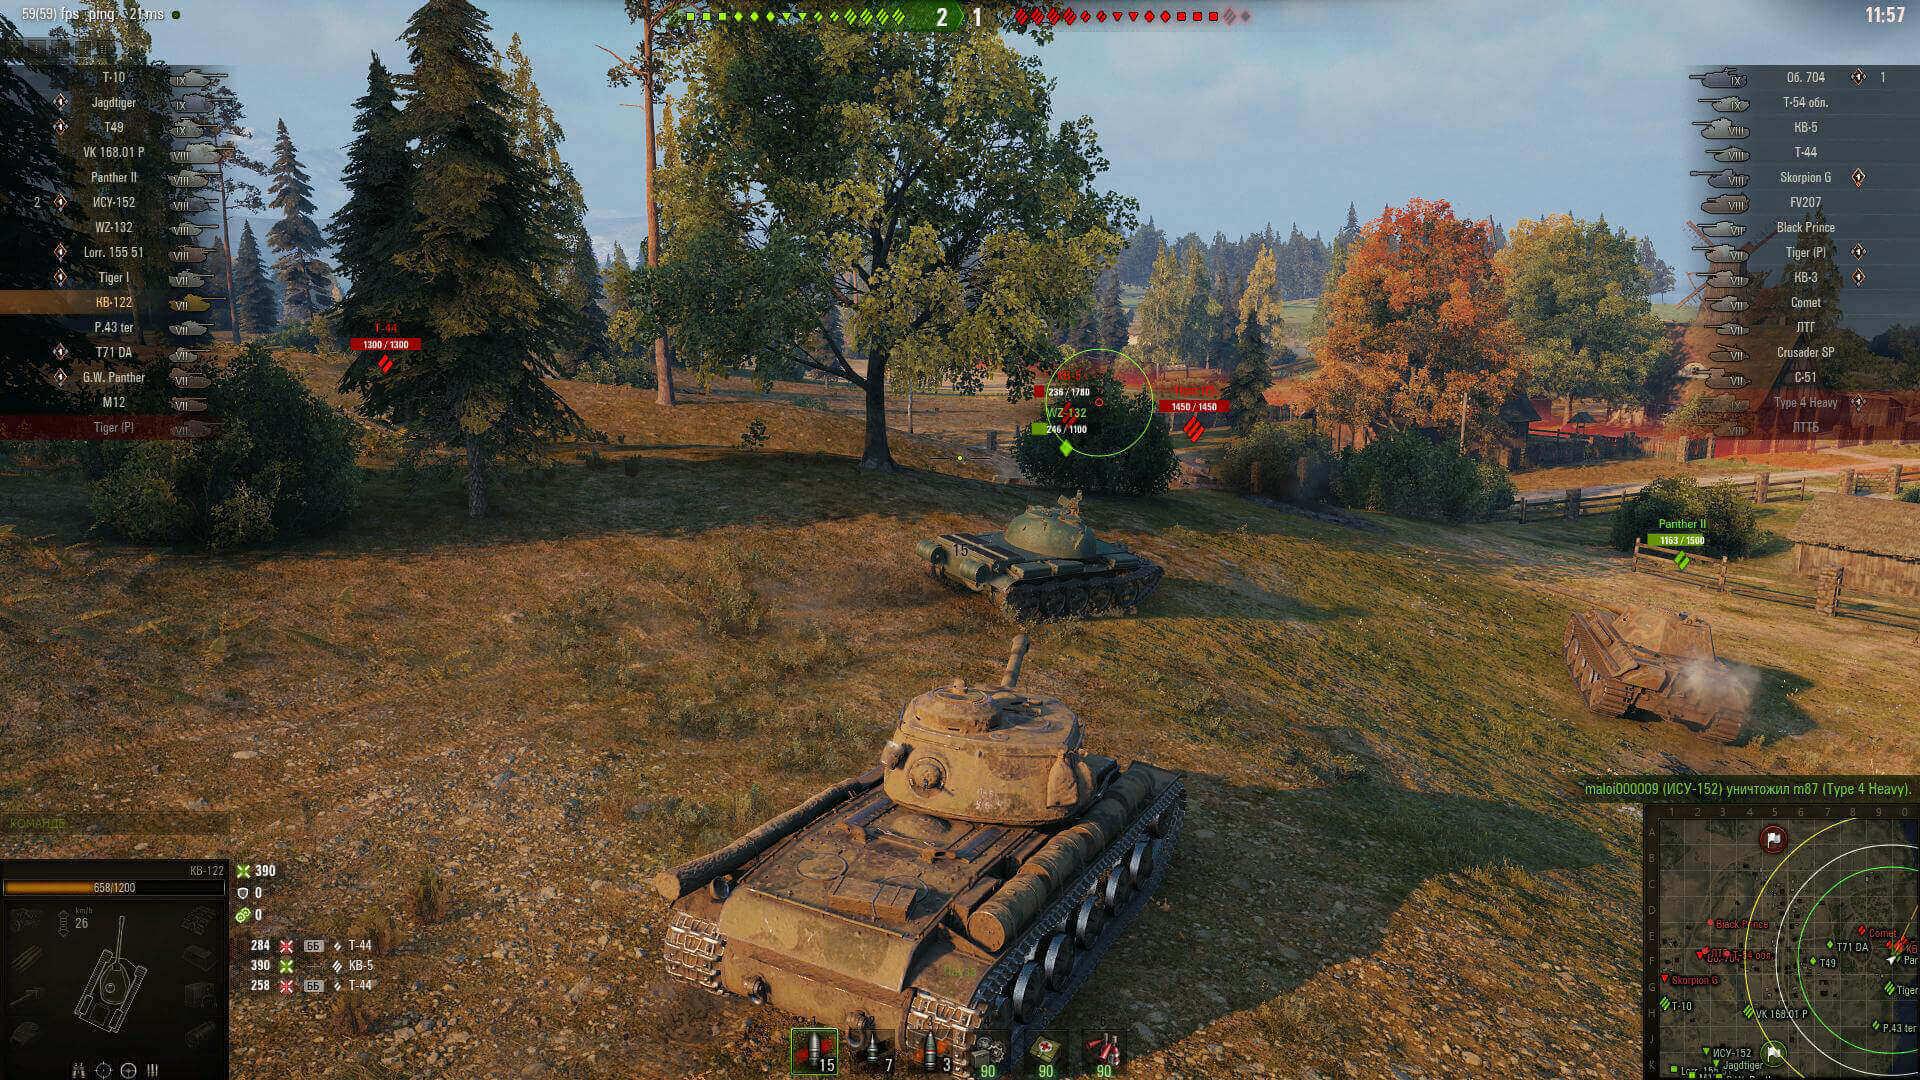 Online Multiplayer Tank Game | World of Tanks